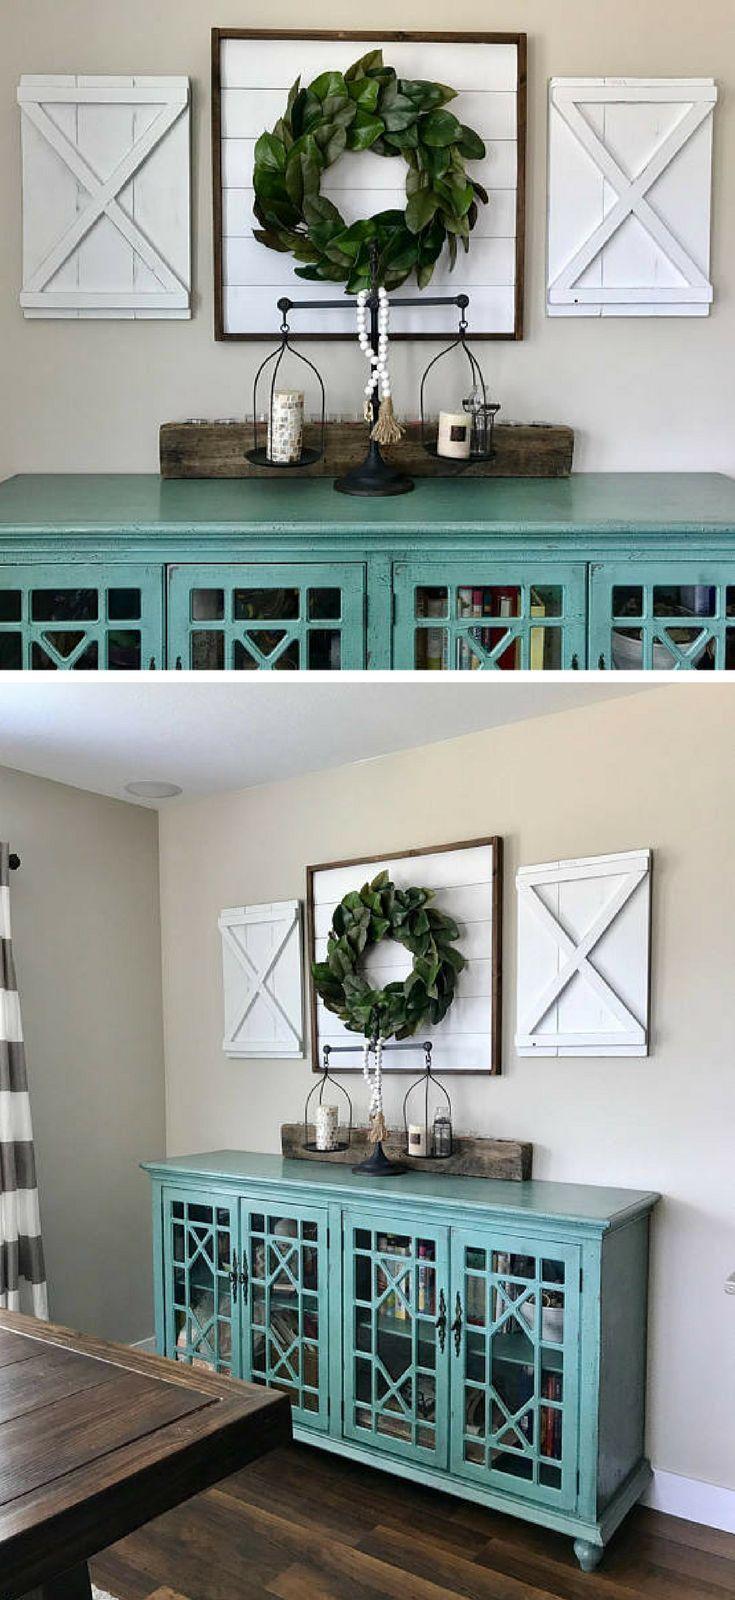 Pair of Large Decorative X Wood Shutters. Rustic shutters. Farmhouse shutters. Shutter decor. Barn doors. Interior shutters. Wreath holder, Farmhouse wall decor, Rustic decor #ad